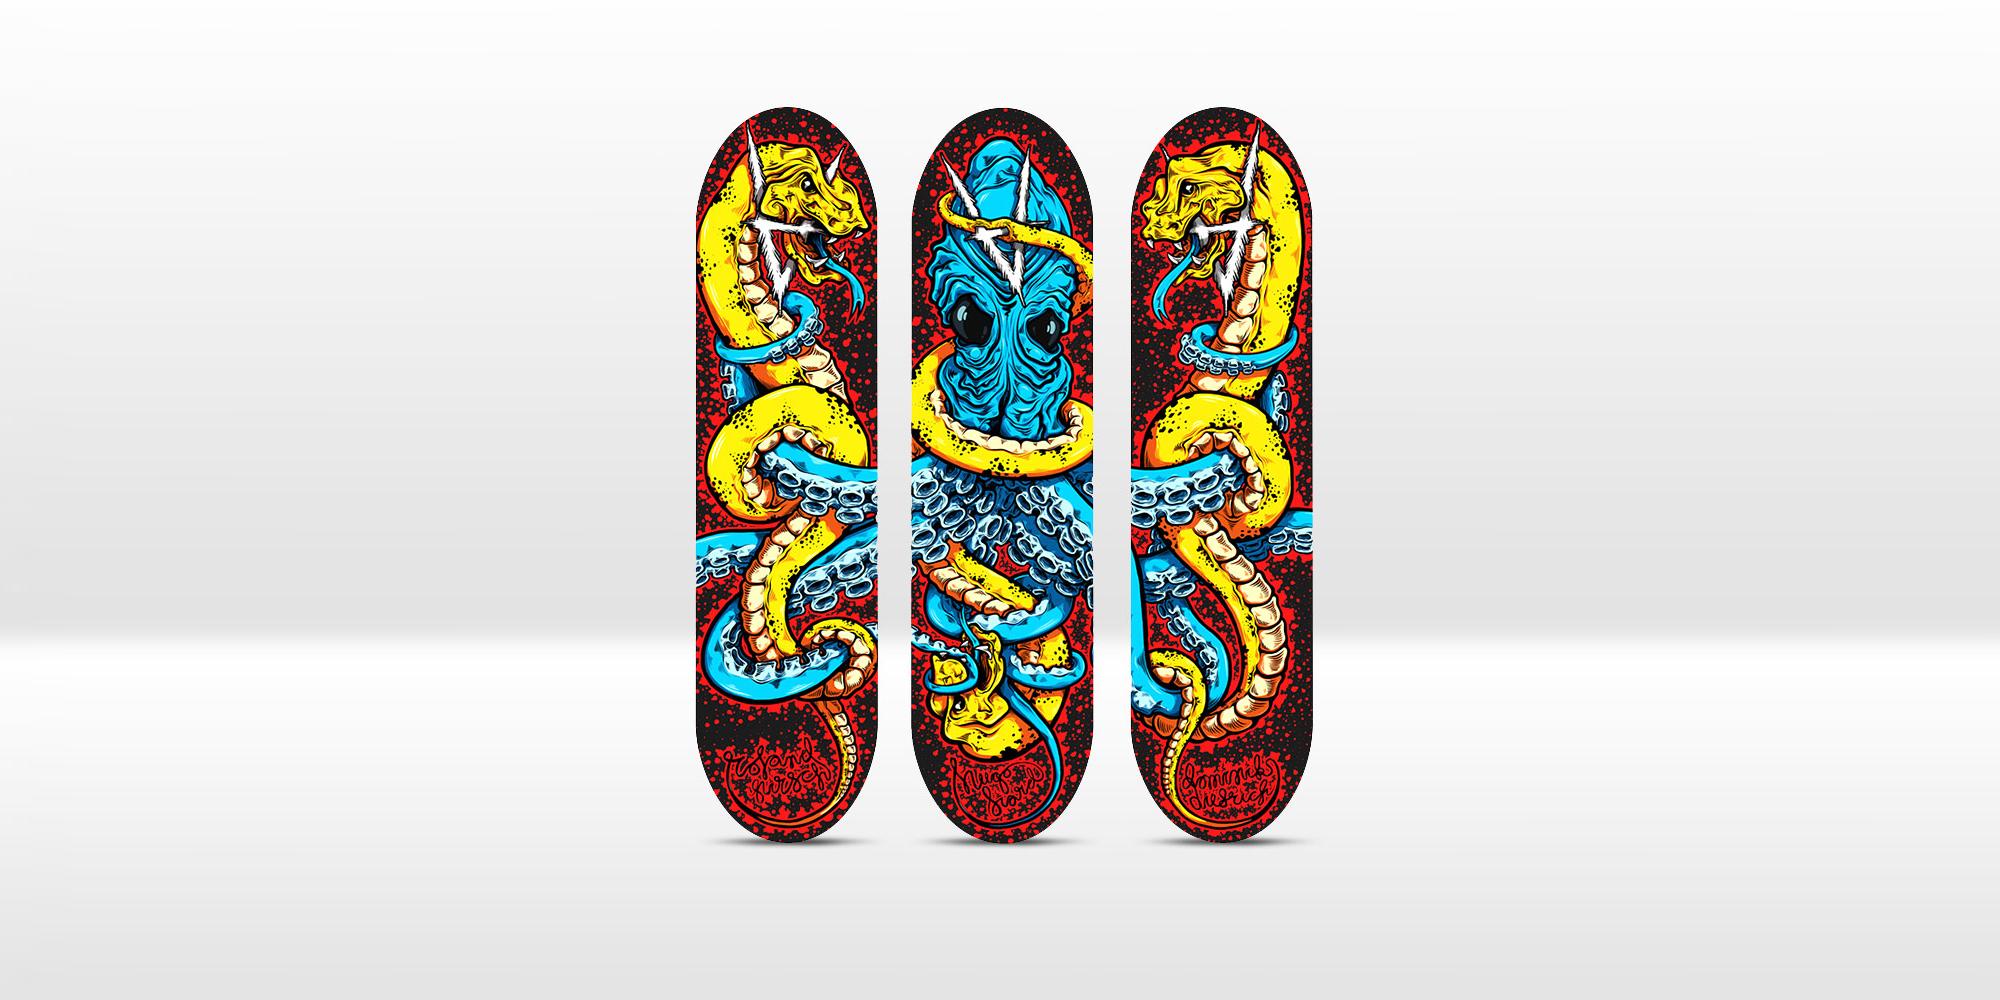 Antiz skateboards detail, Mikko Rauhamäki